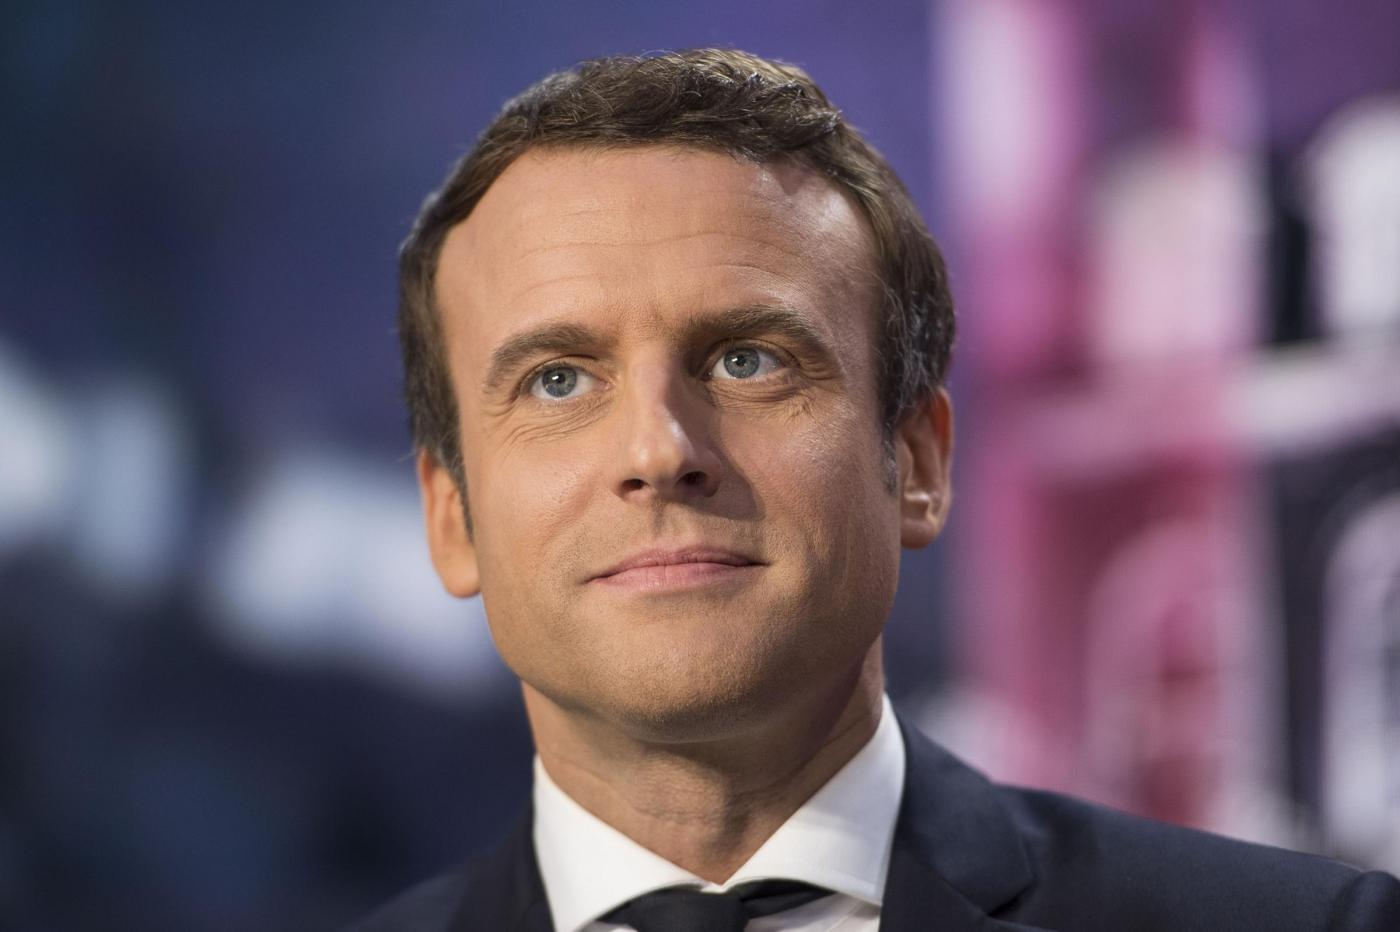 Emmanuel Macron alla tv francese